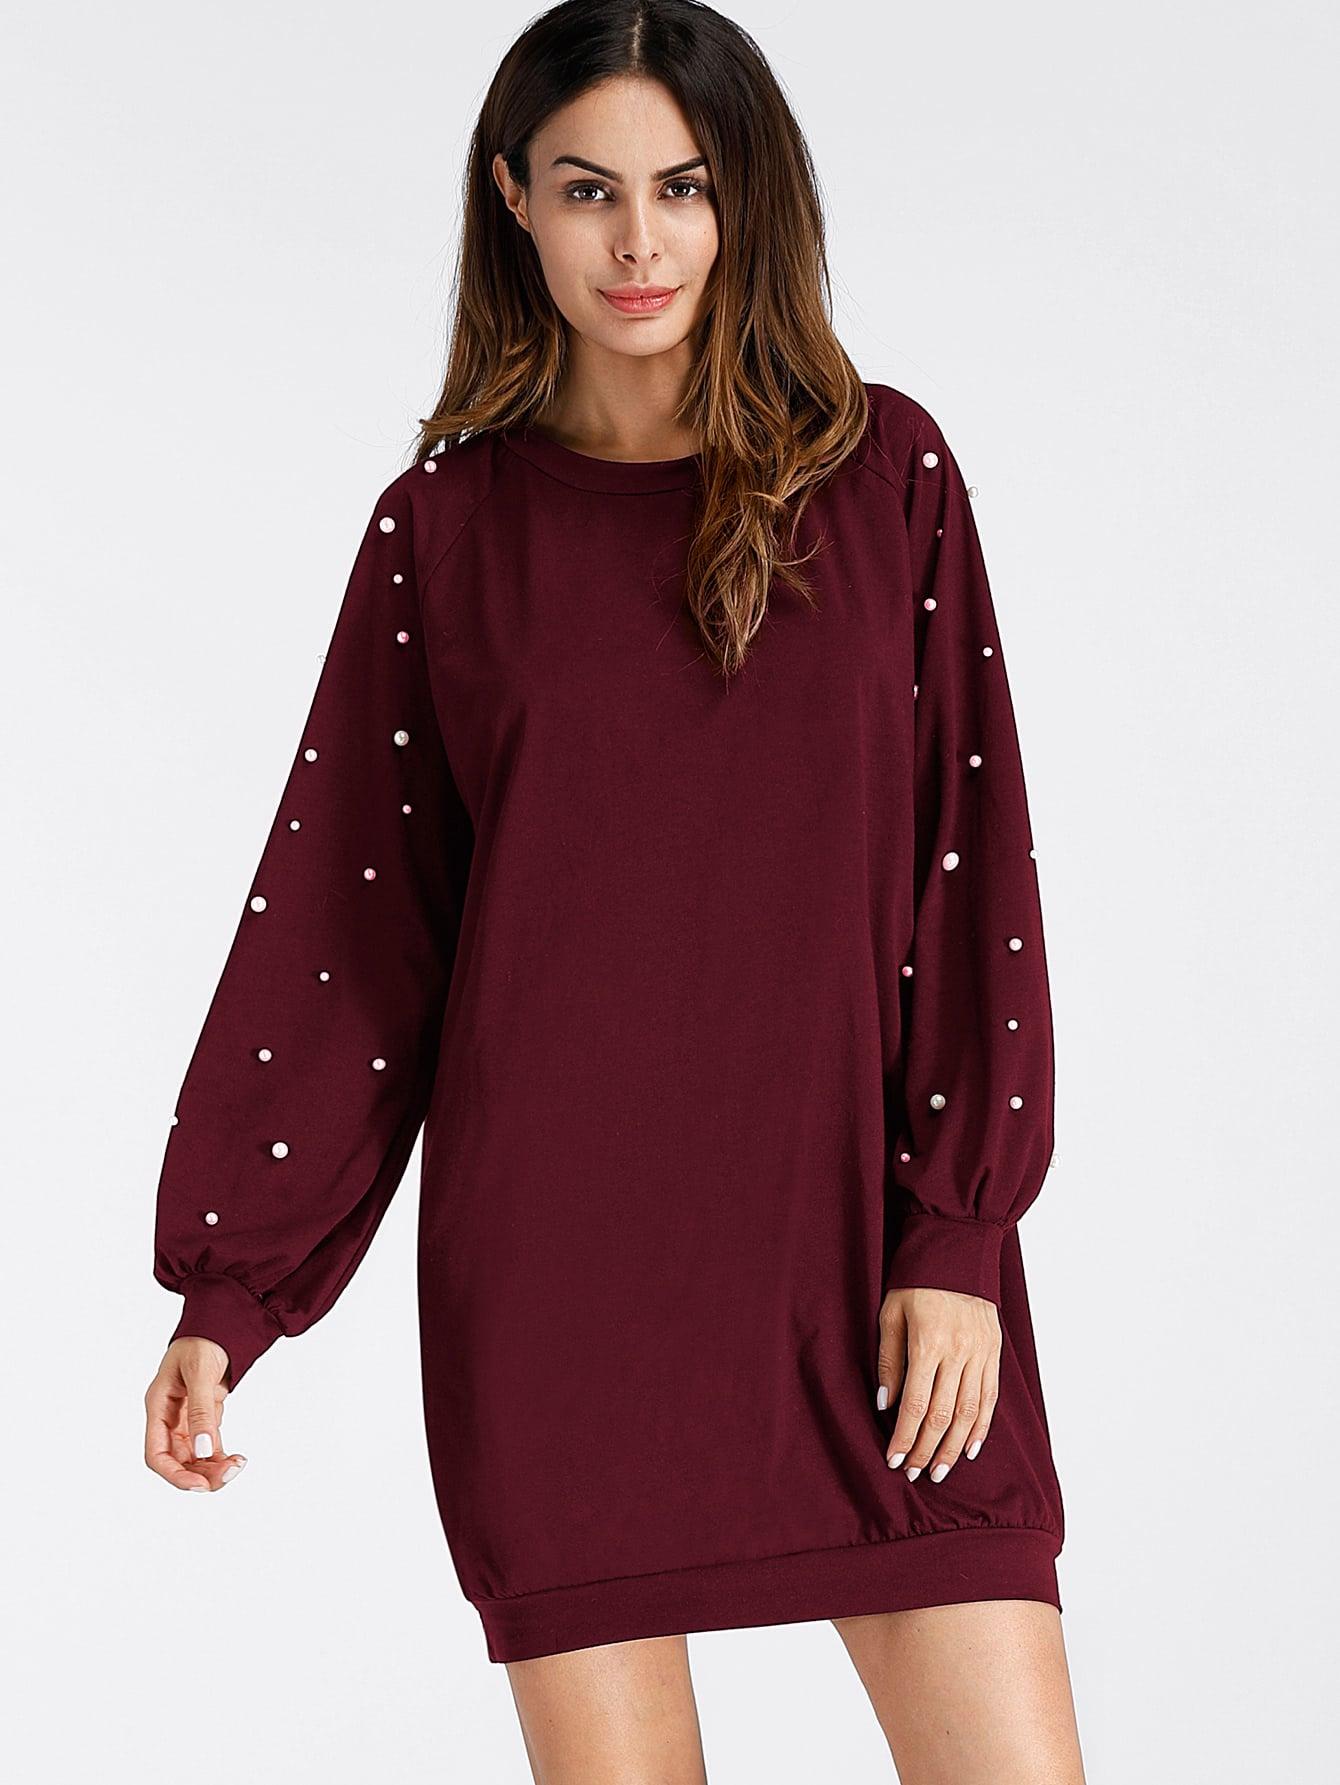 Sweatshirt Kleid mit Perlen